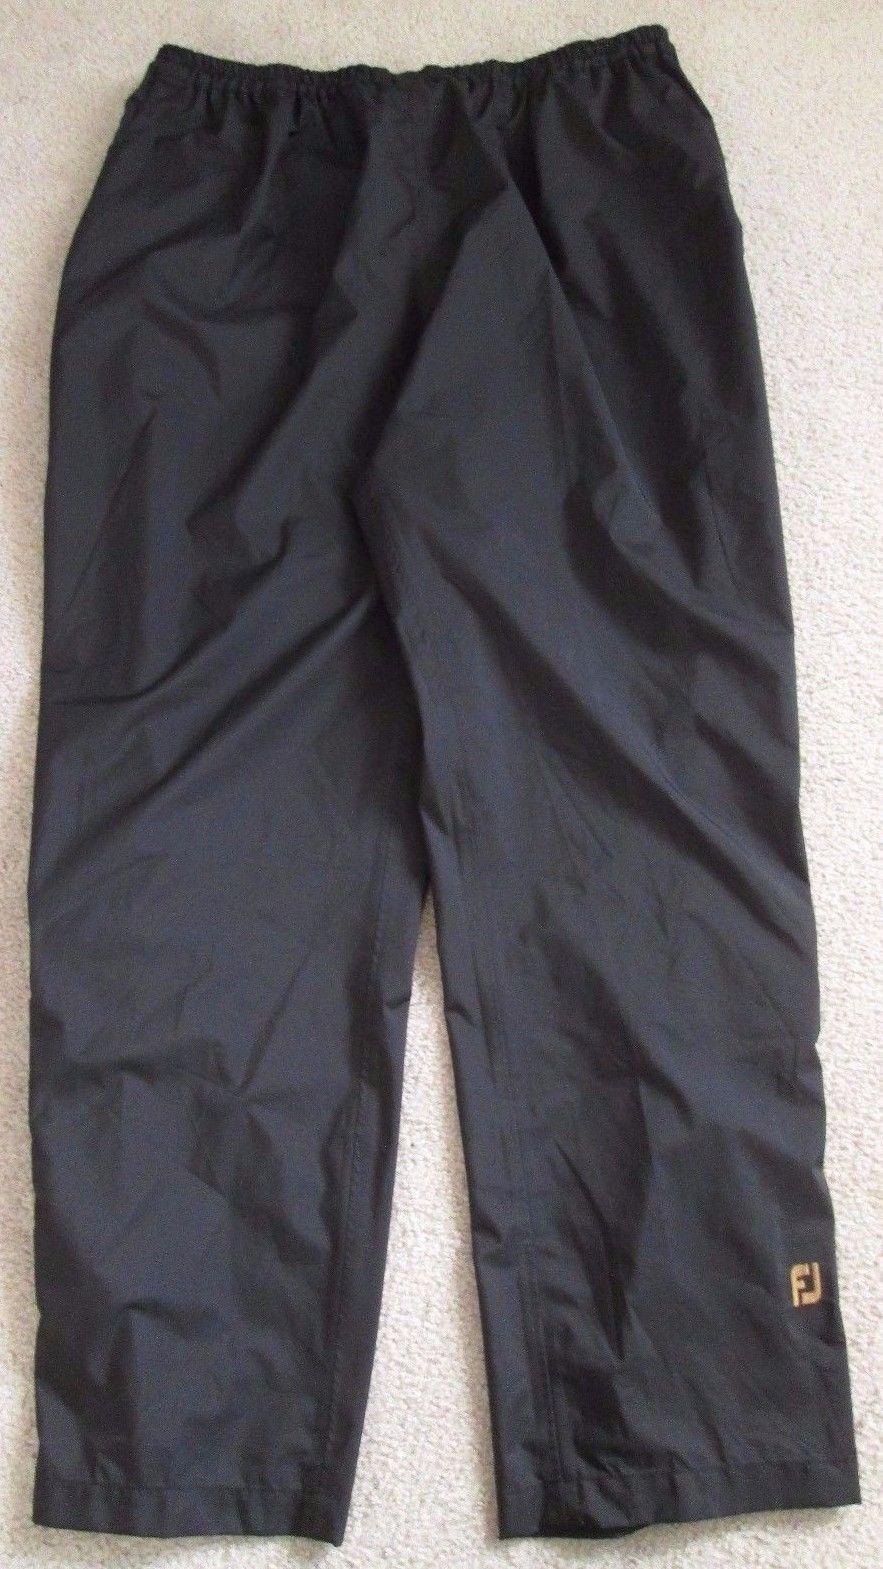 9778751afb6f Mens Black DryJoys by FootJoy Performance Light Waterproof Golf Pants -  Size XXL